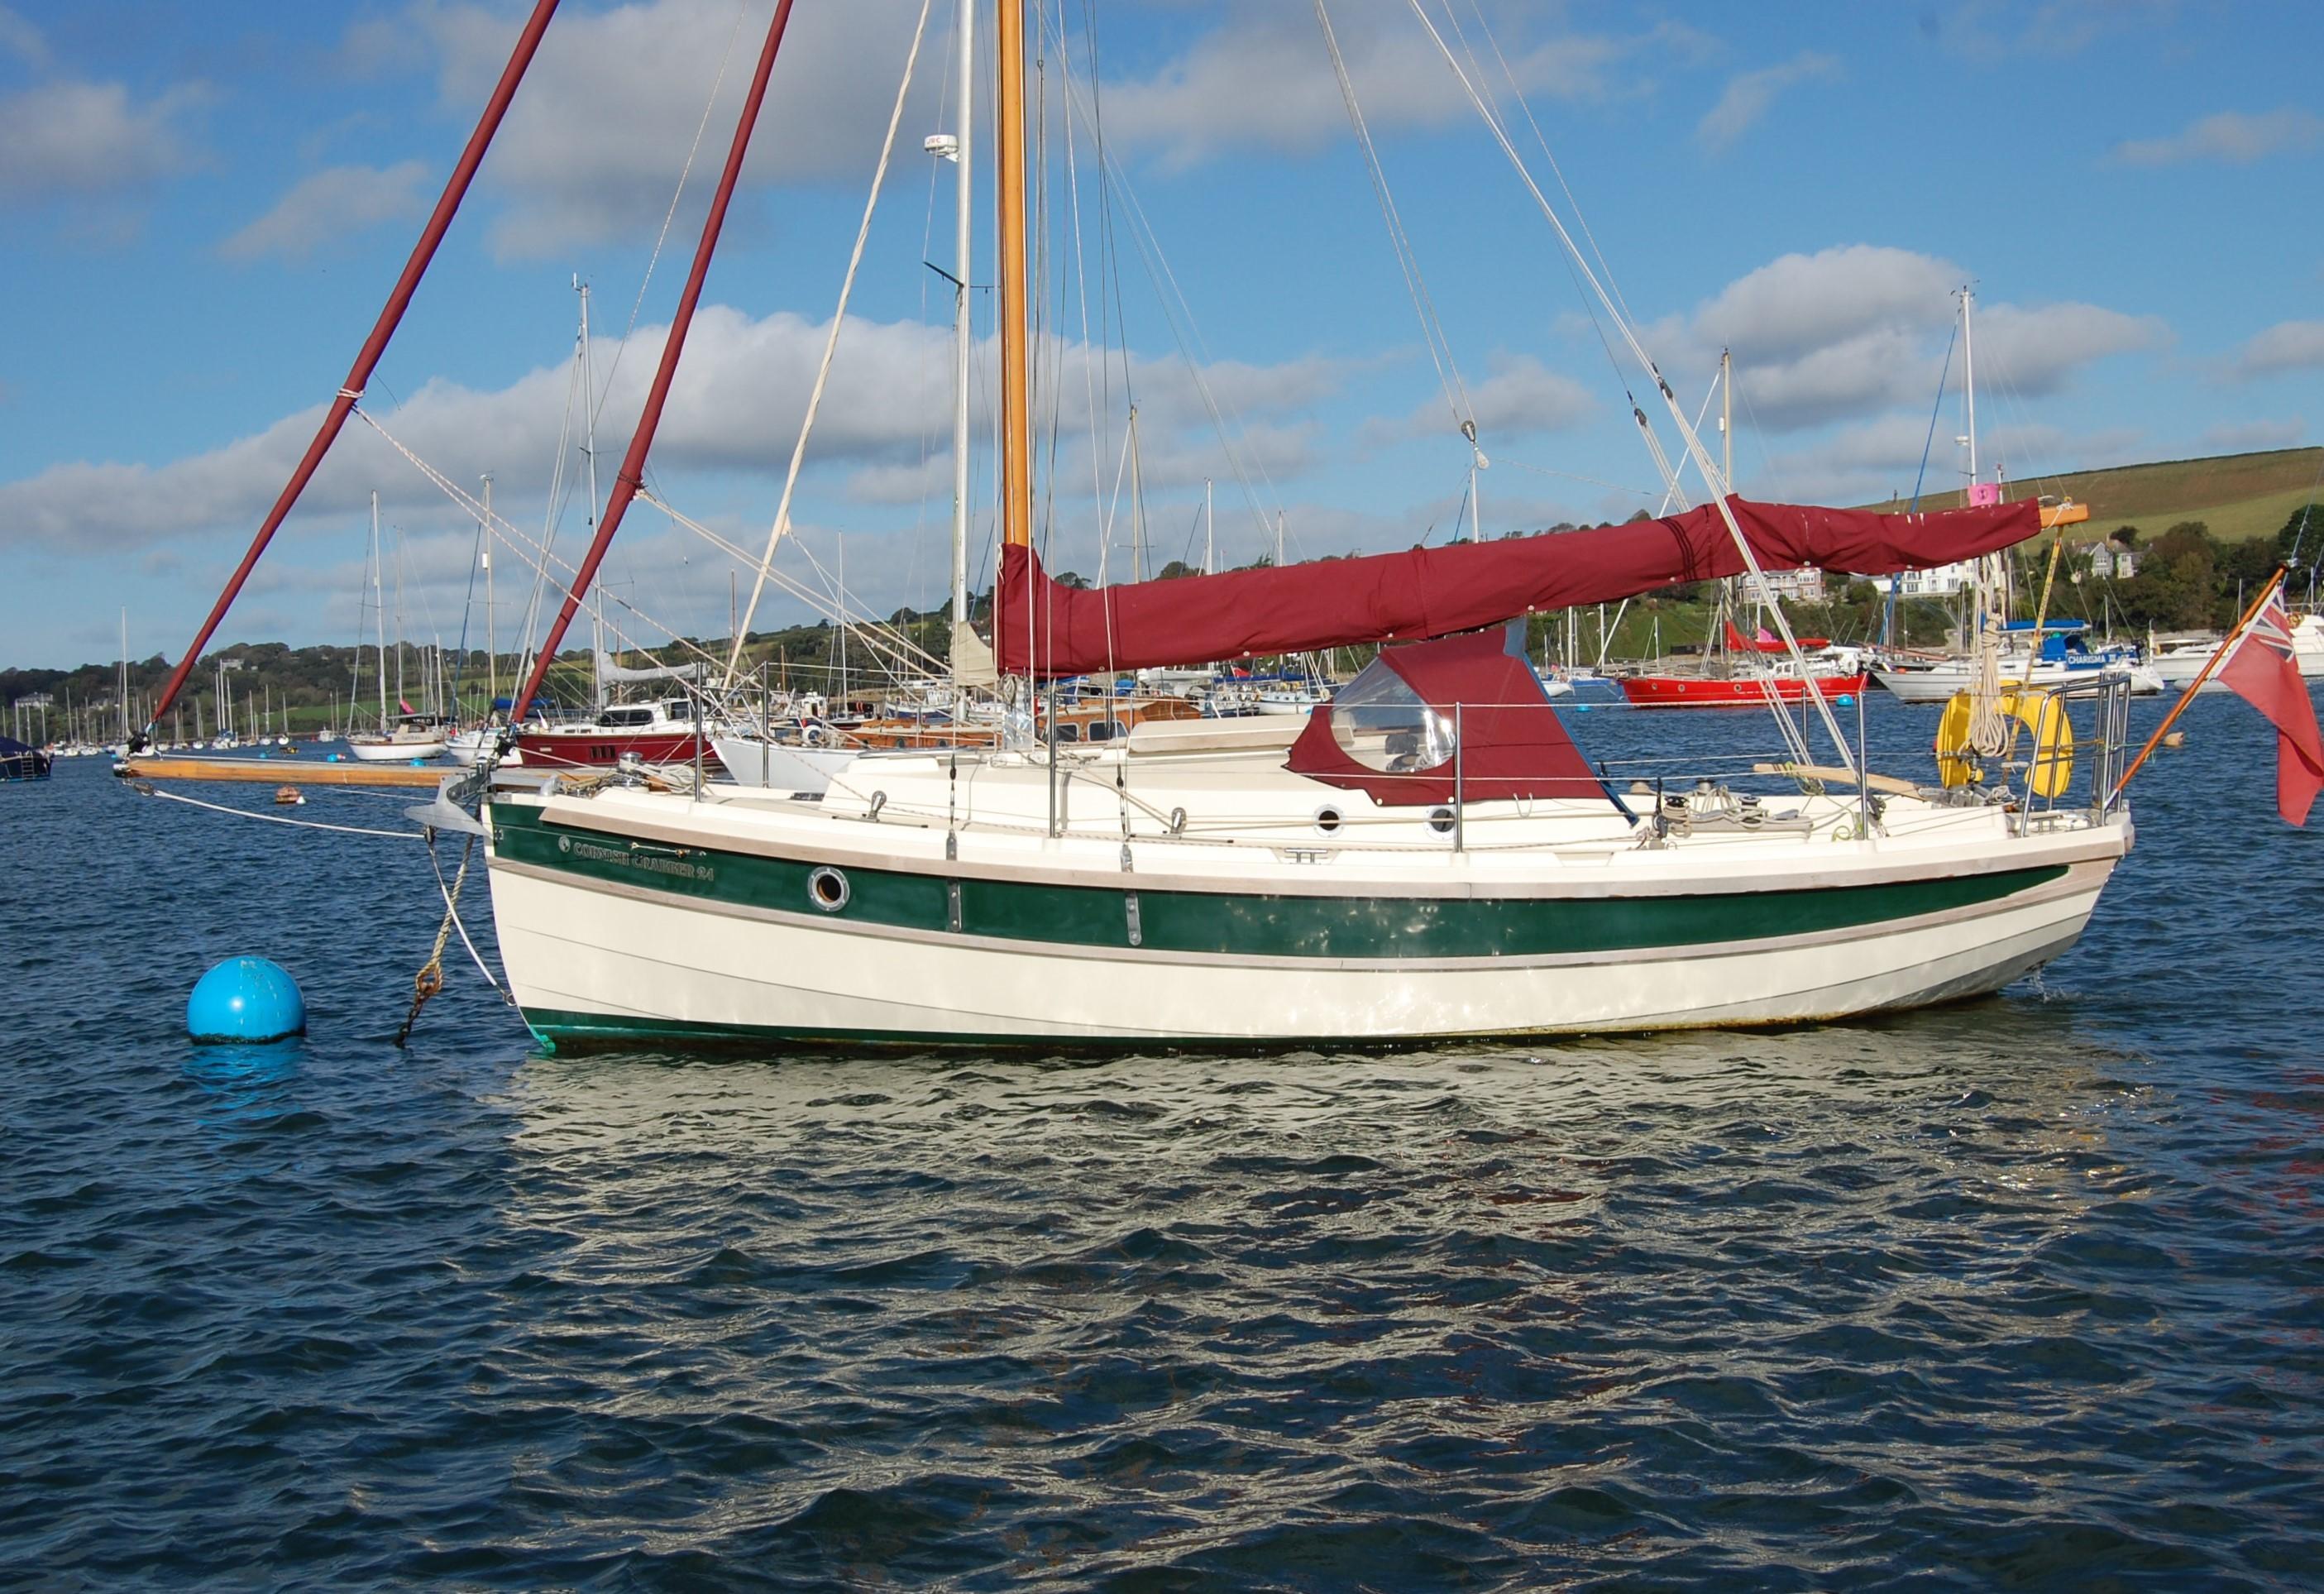 Cornish Crabber 24 Cornish Crabber 24